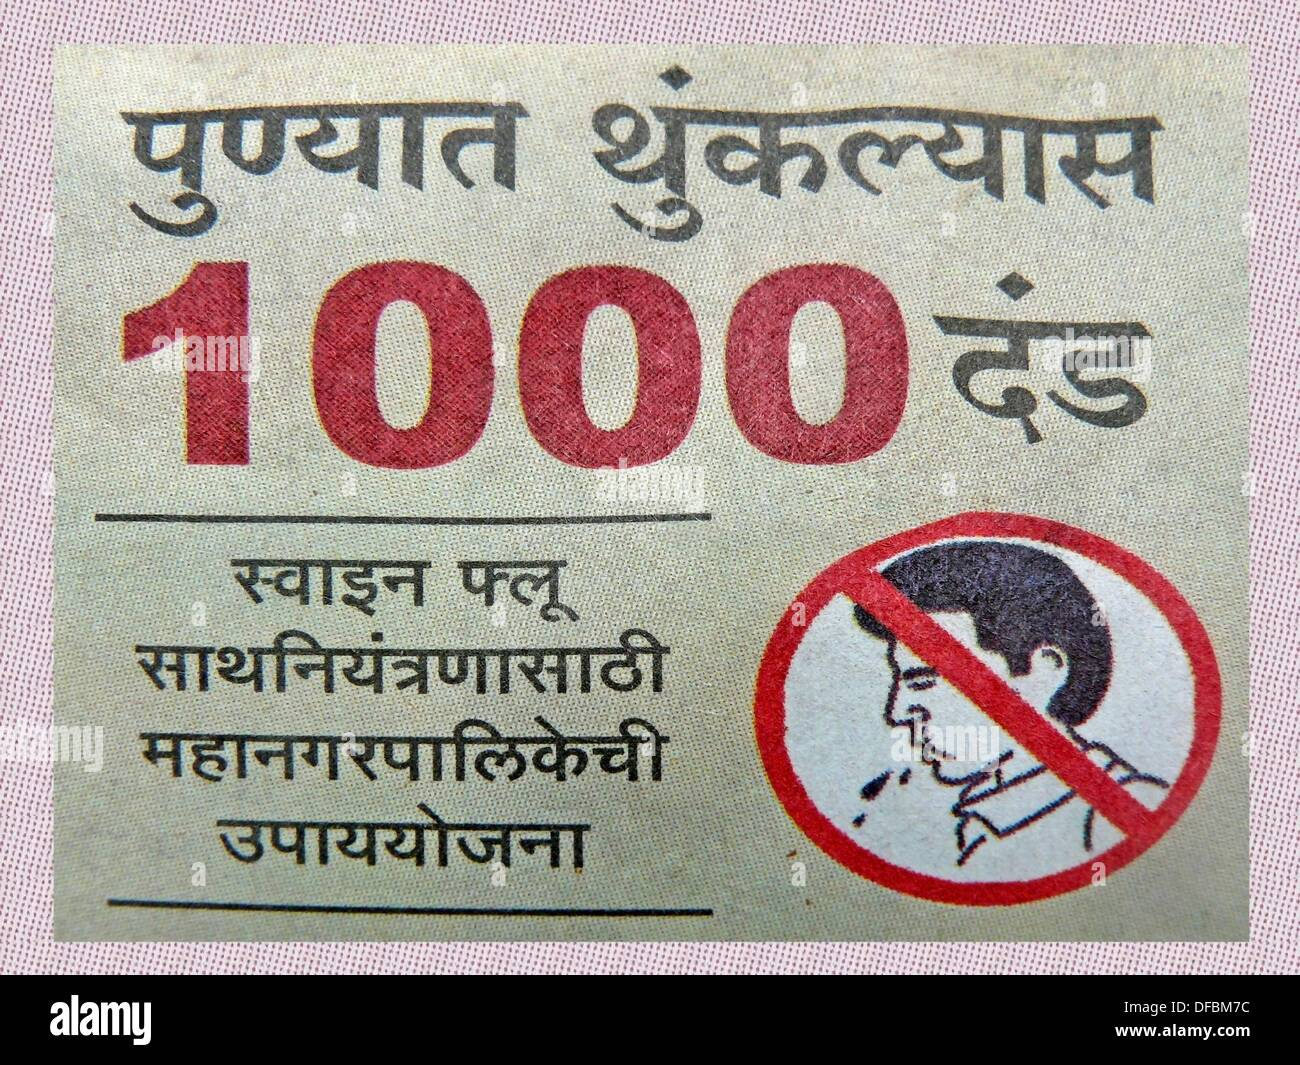 Article on Swine flu in Marathi, Regional language newspaper Stock Photo